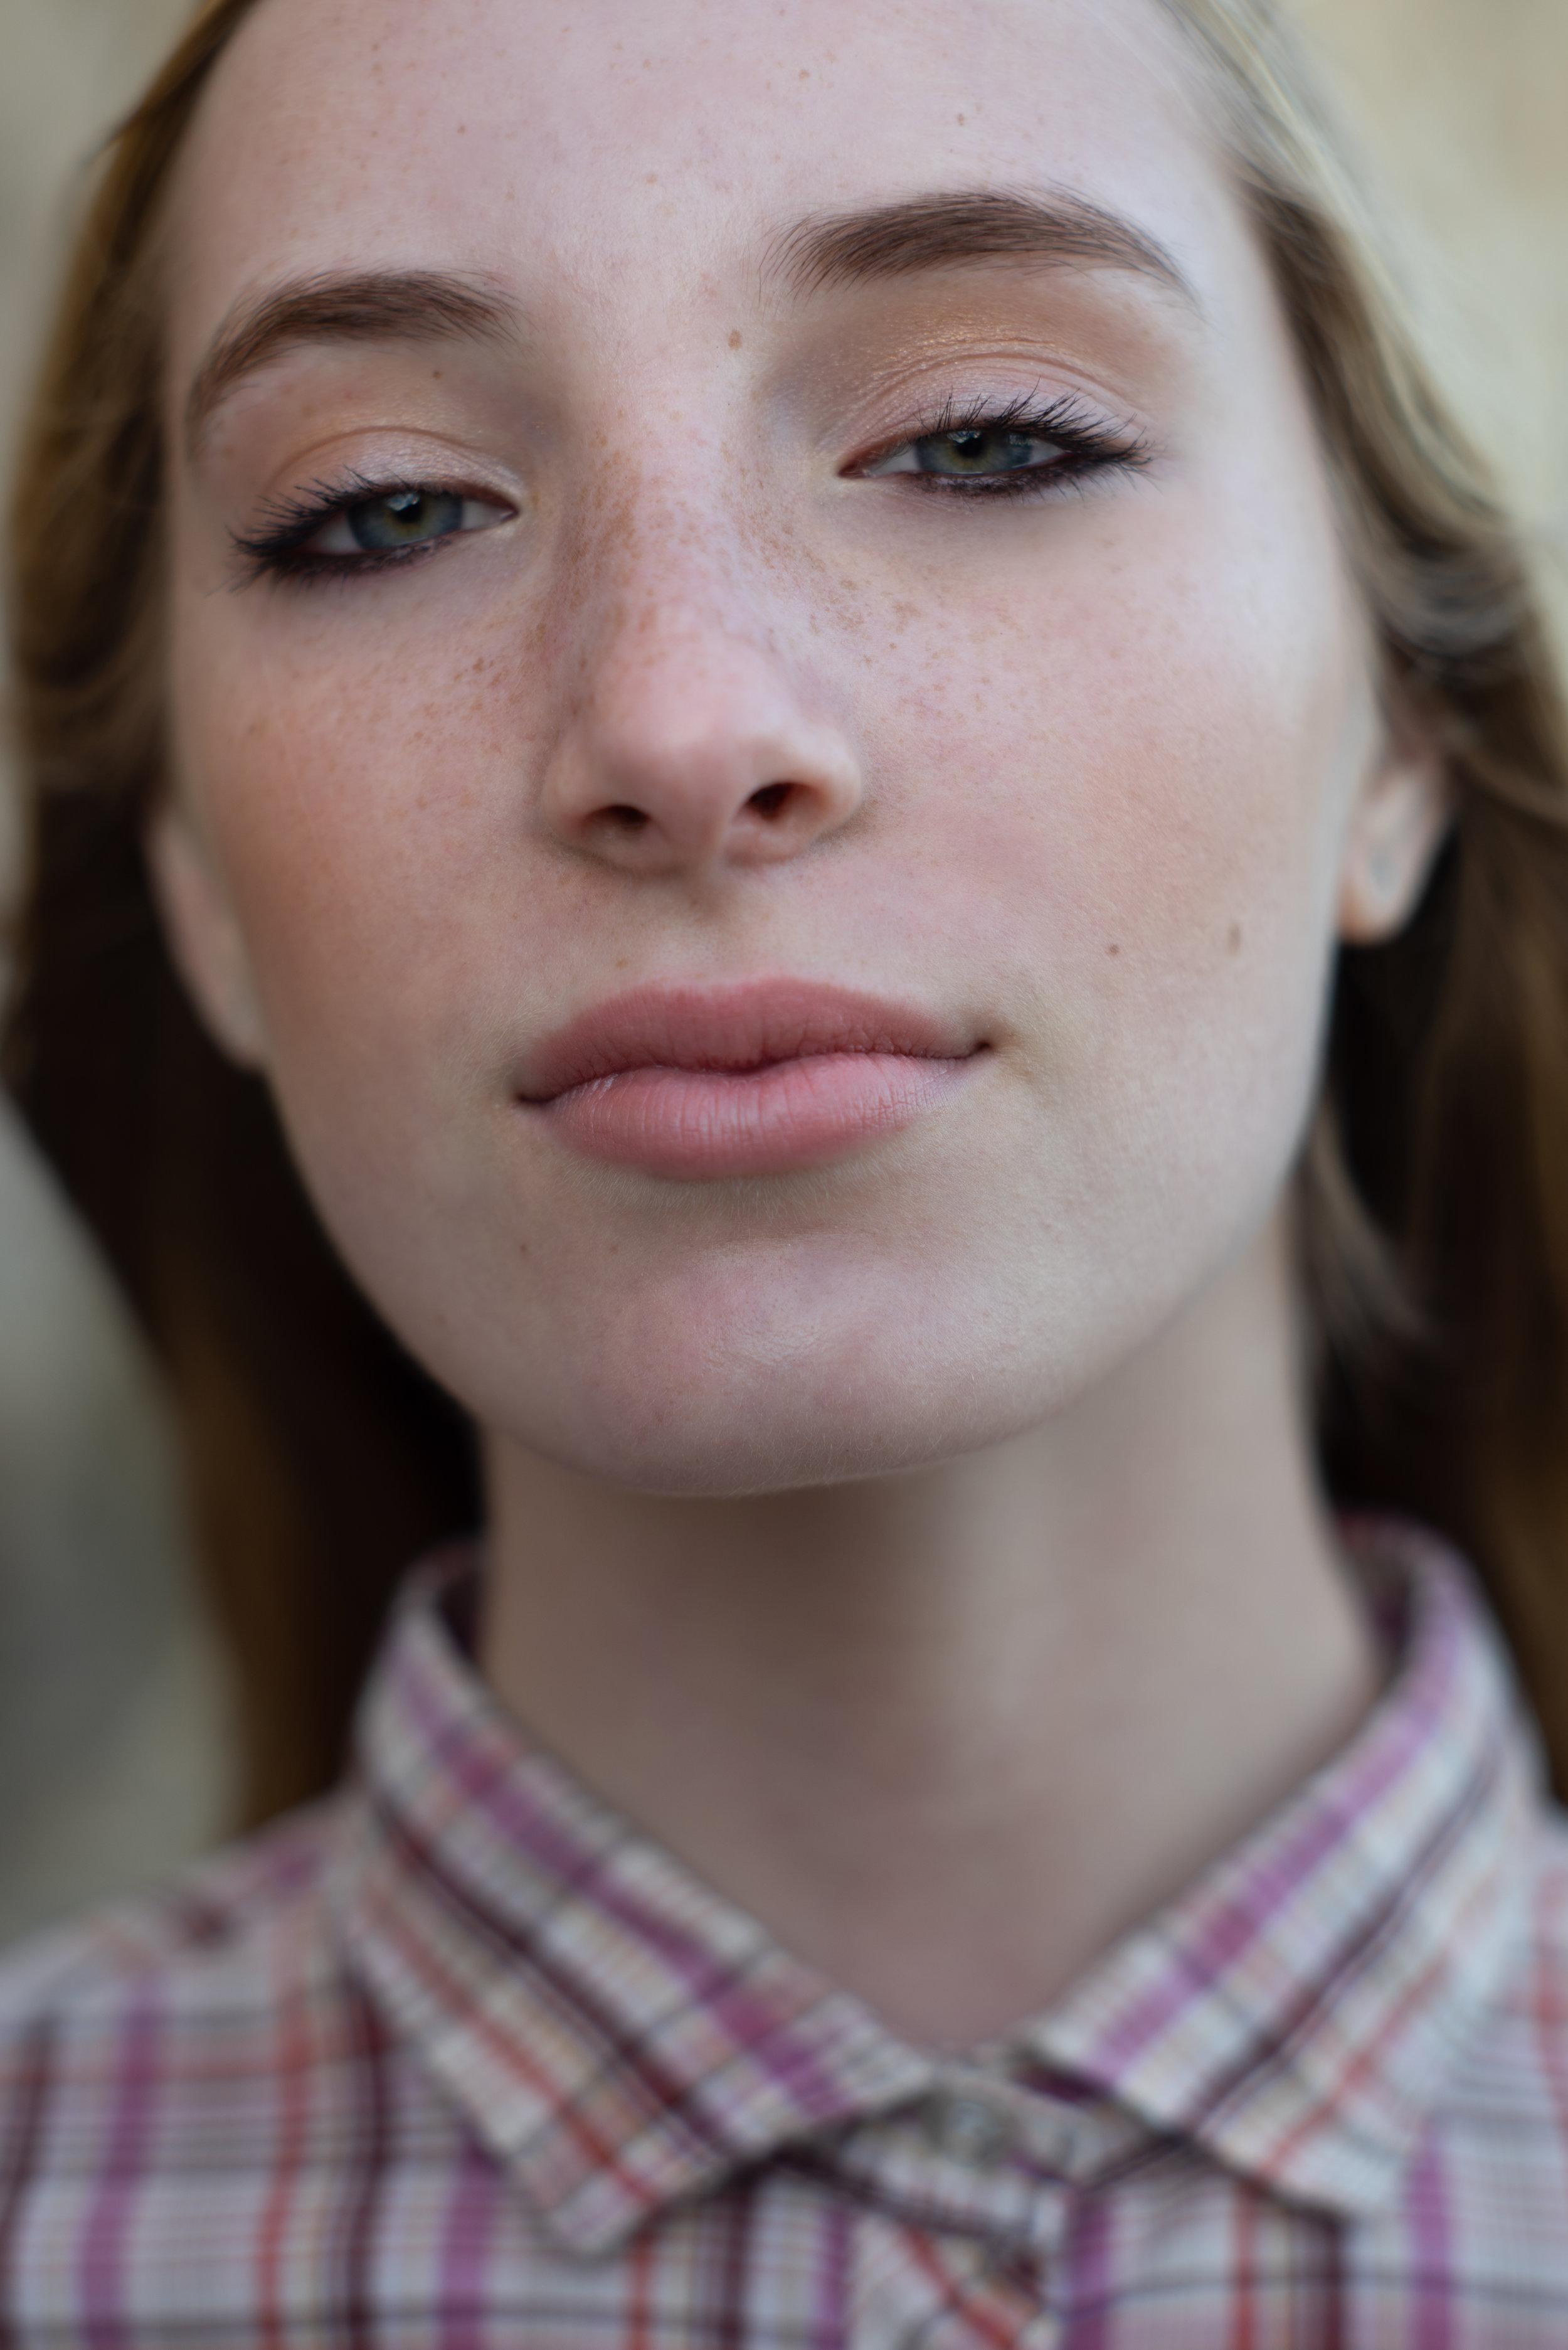 2018_Hudson_Serletic_Portrait_Eyes_2.jpg